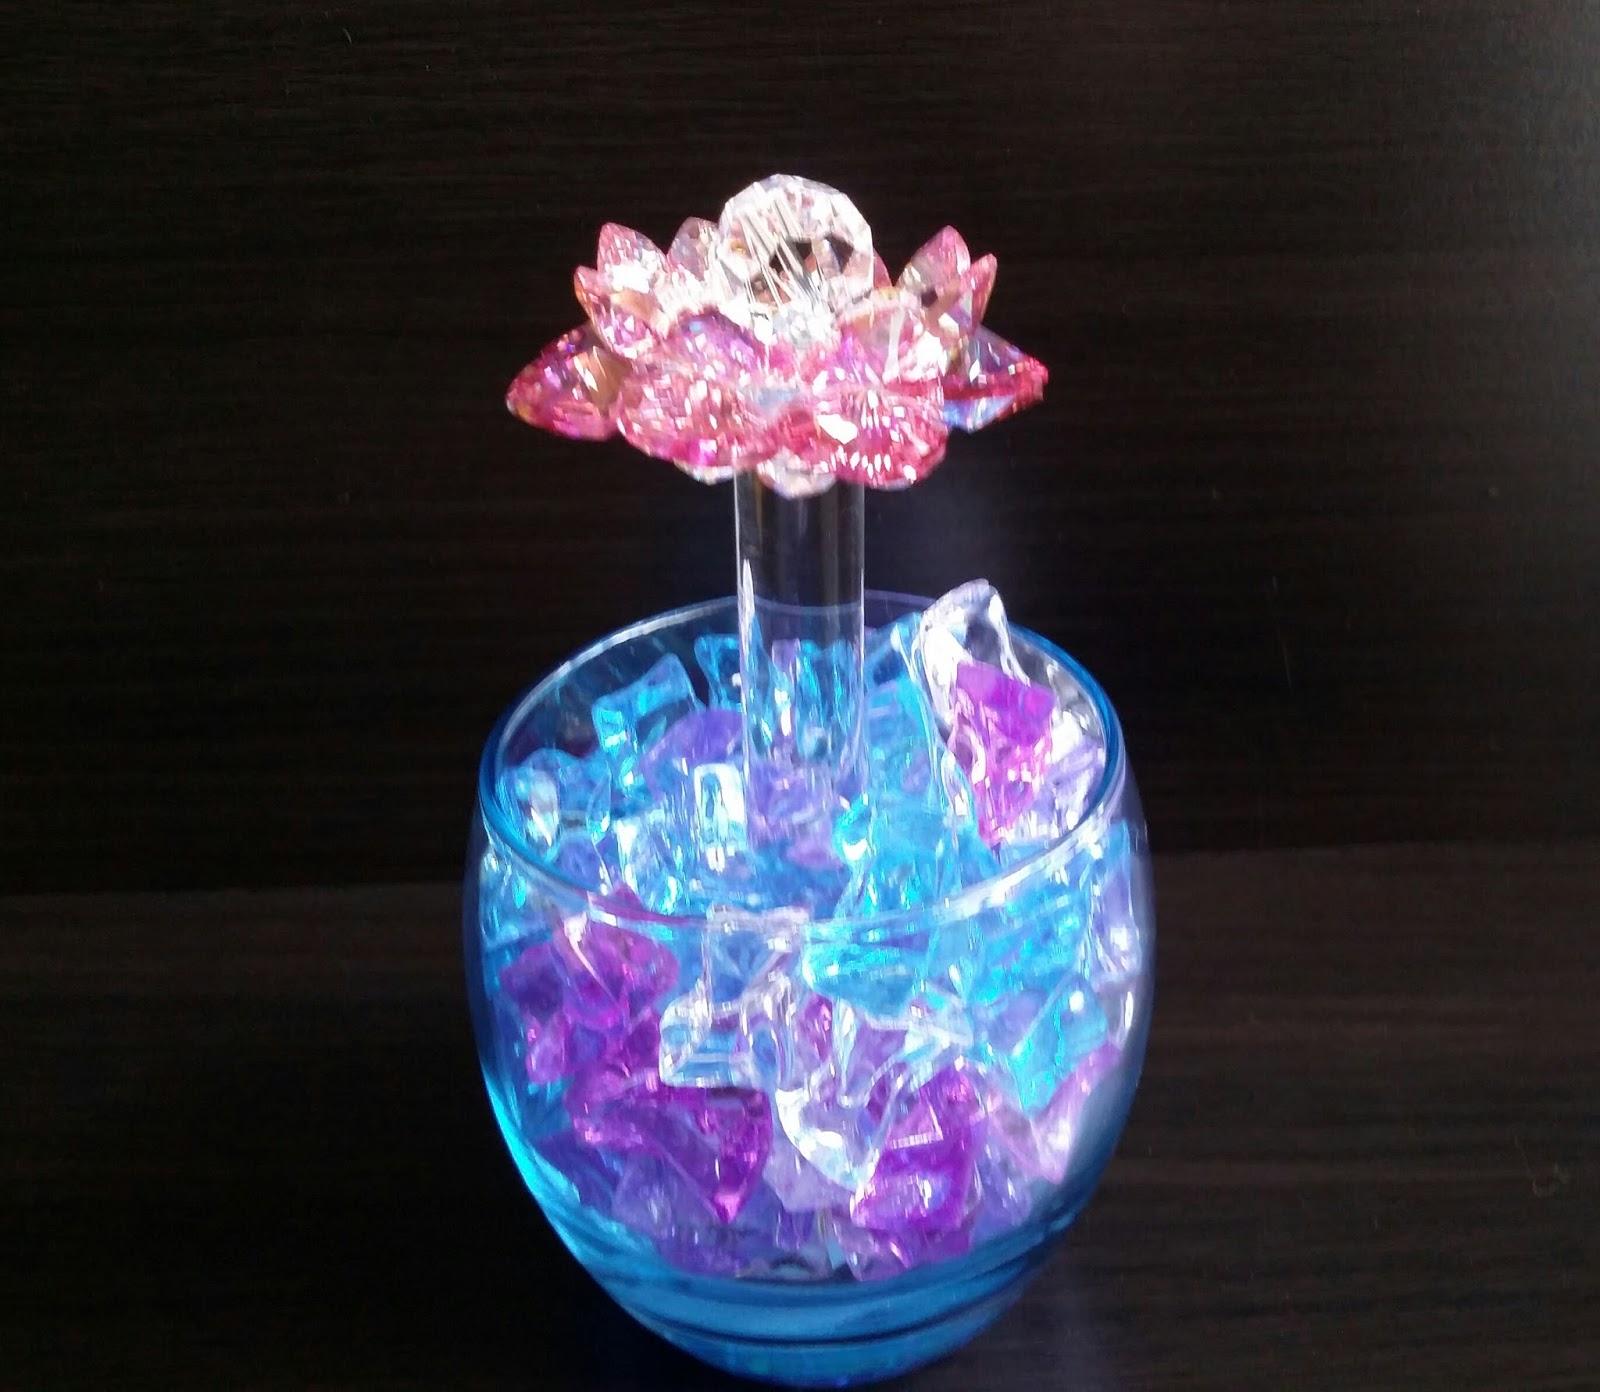 Sacred Crystal Lotus Sacred Crystal Lotus Flower For Display At